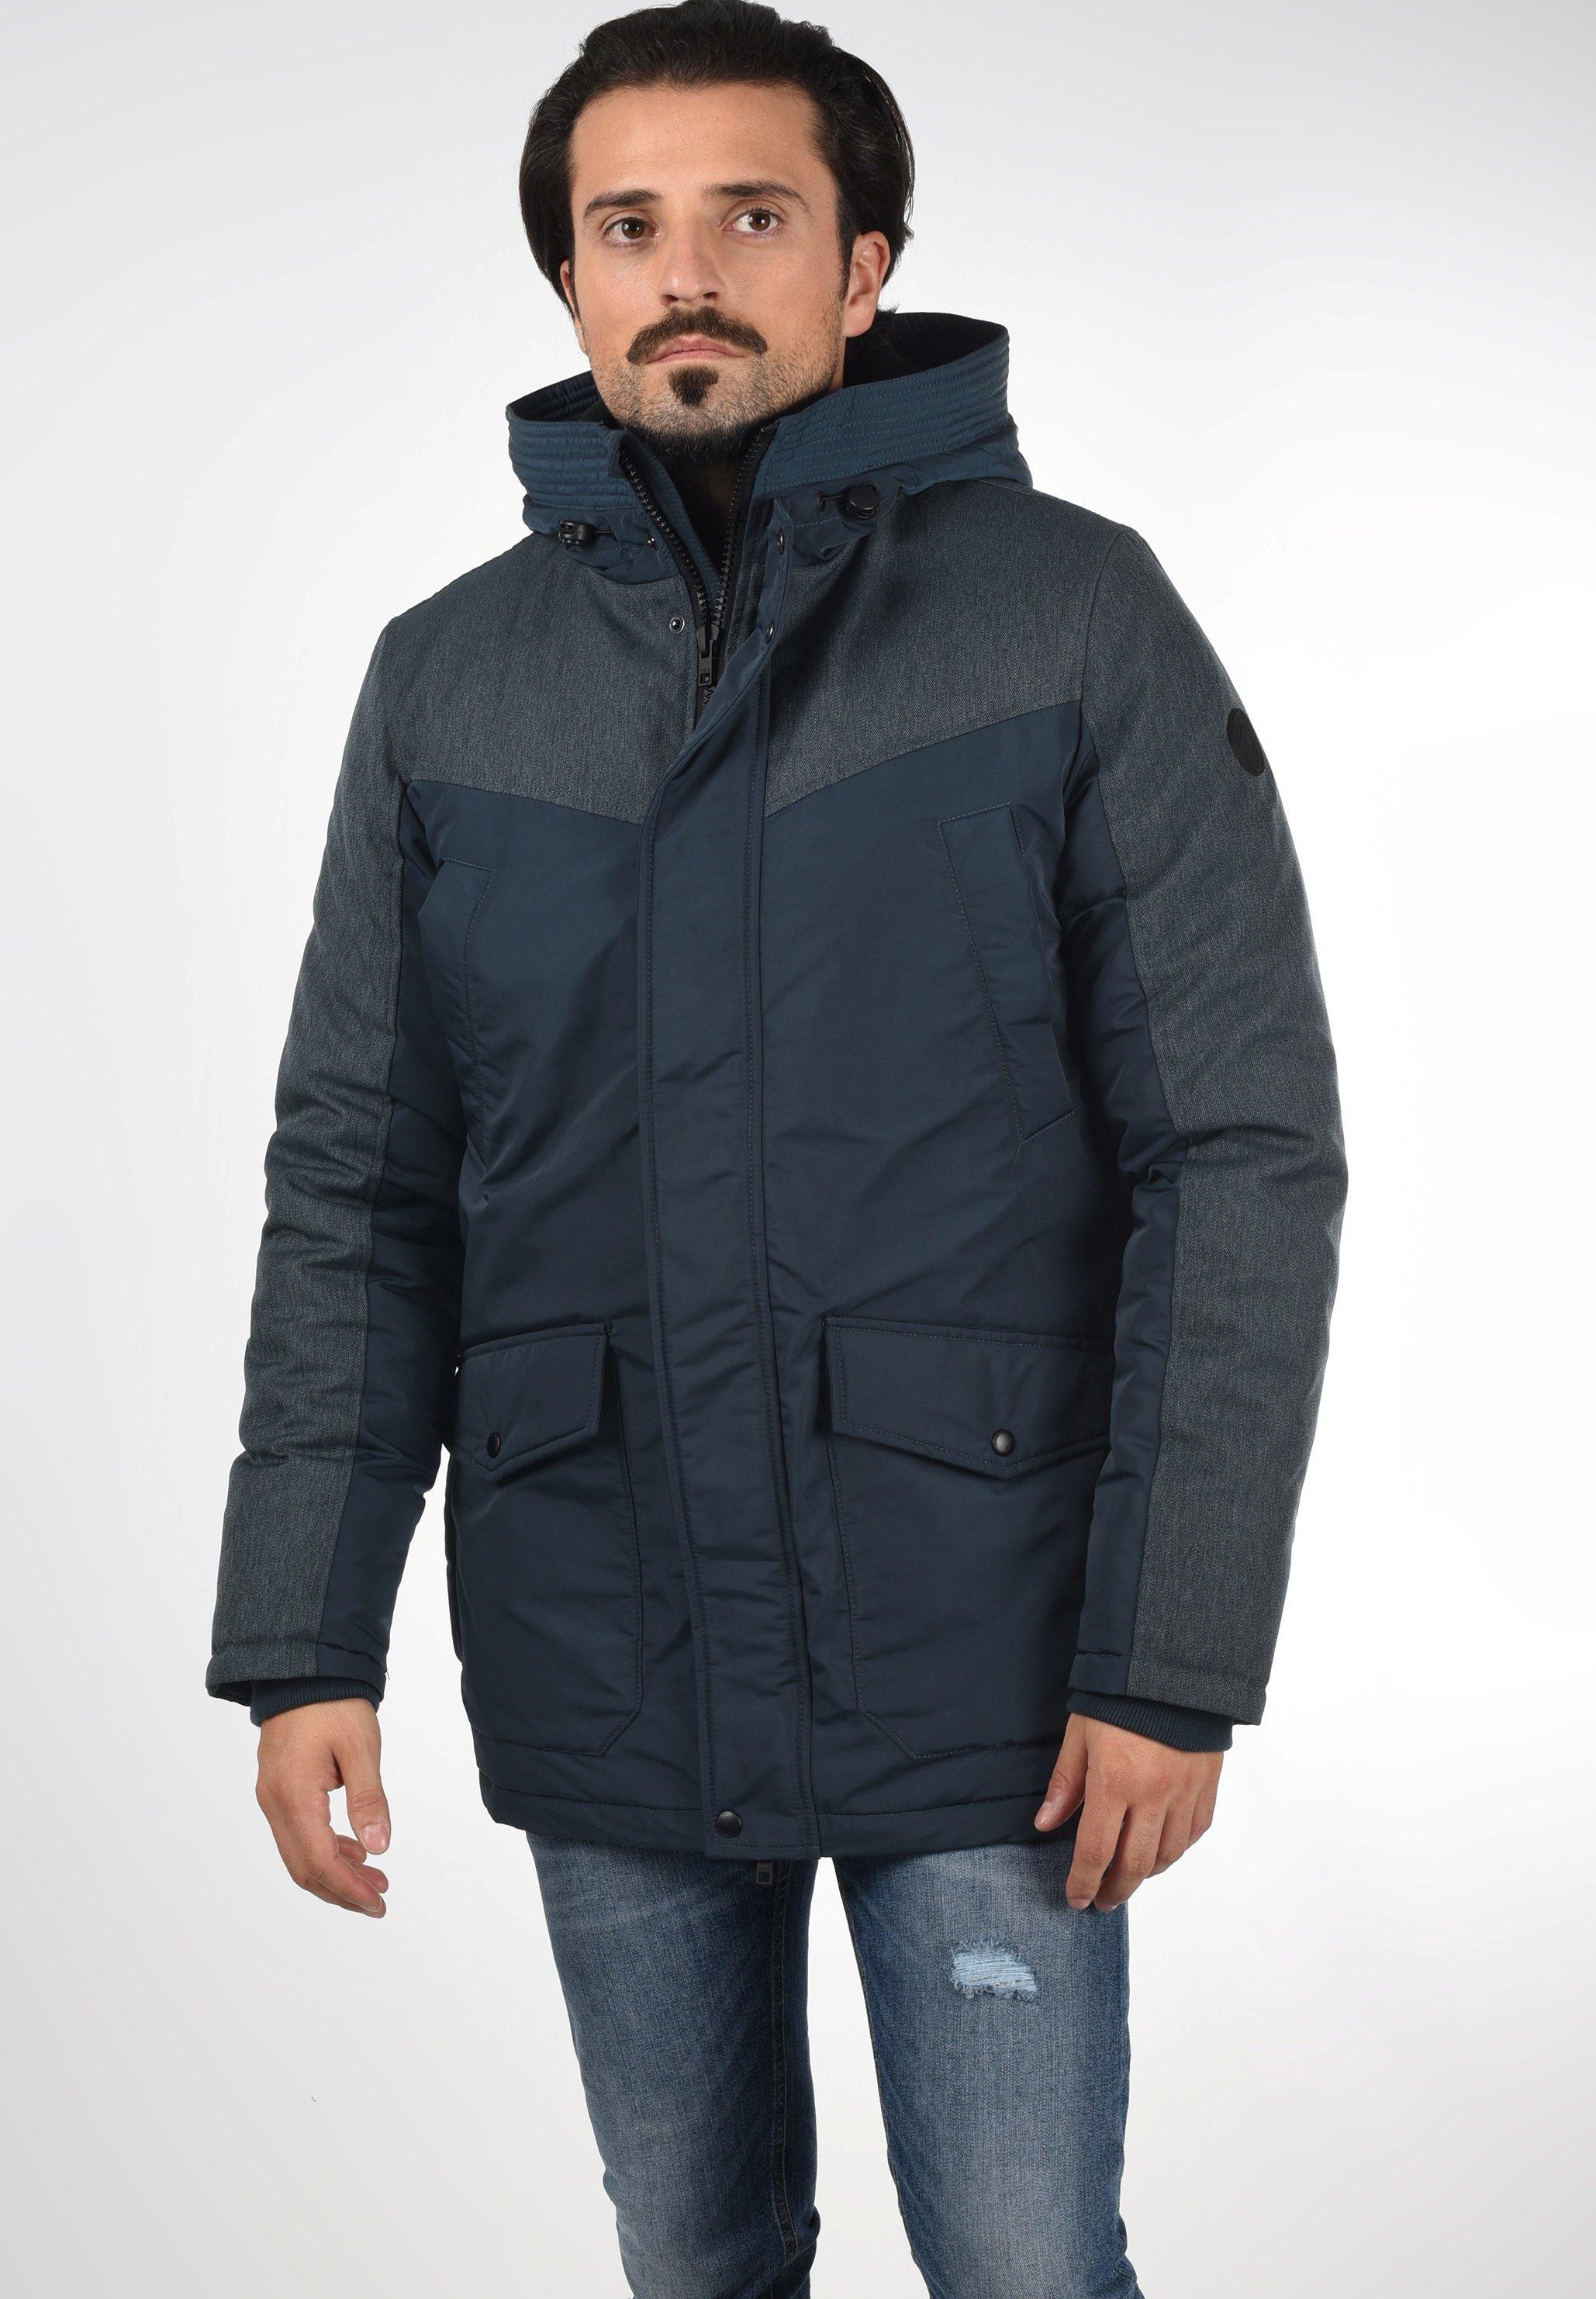 Homme INKO - Veste d'hiver